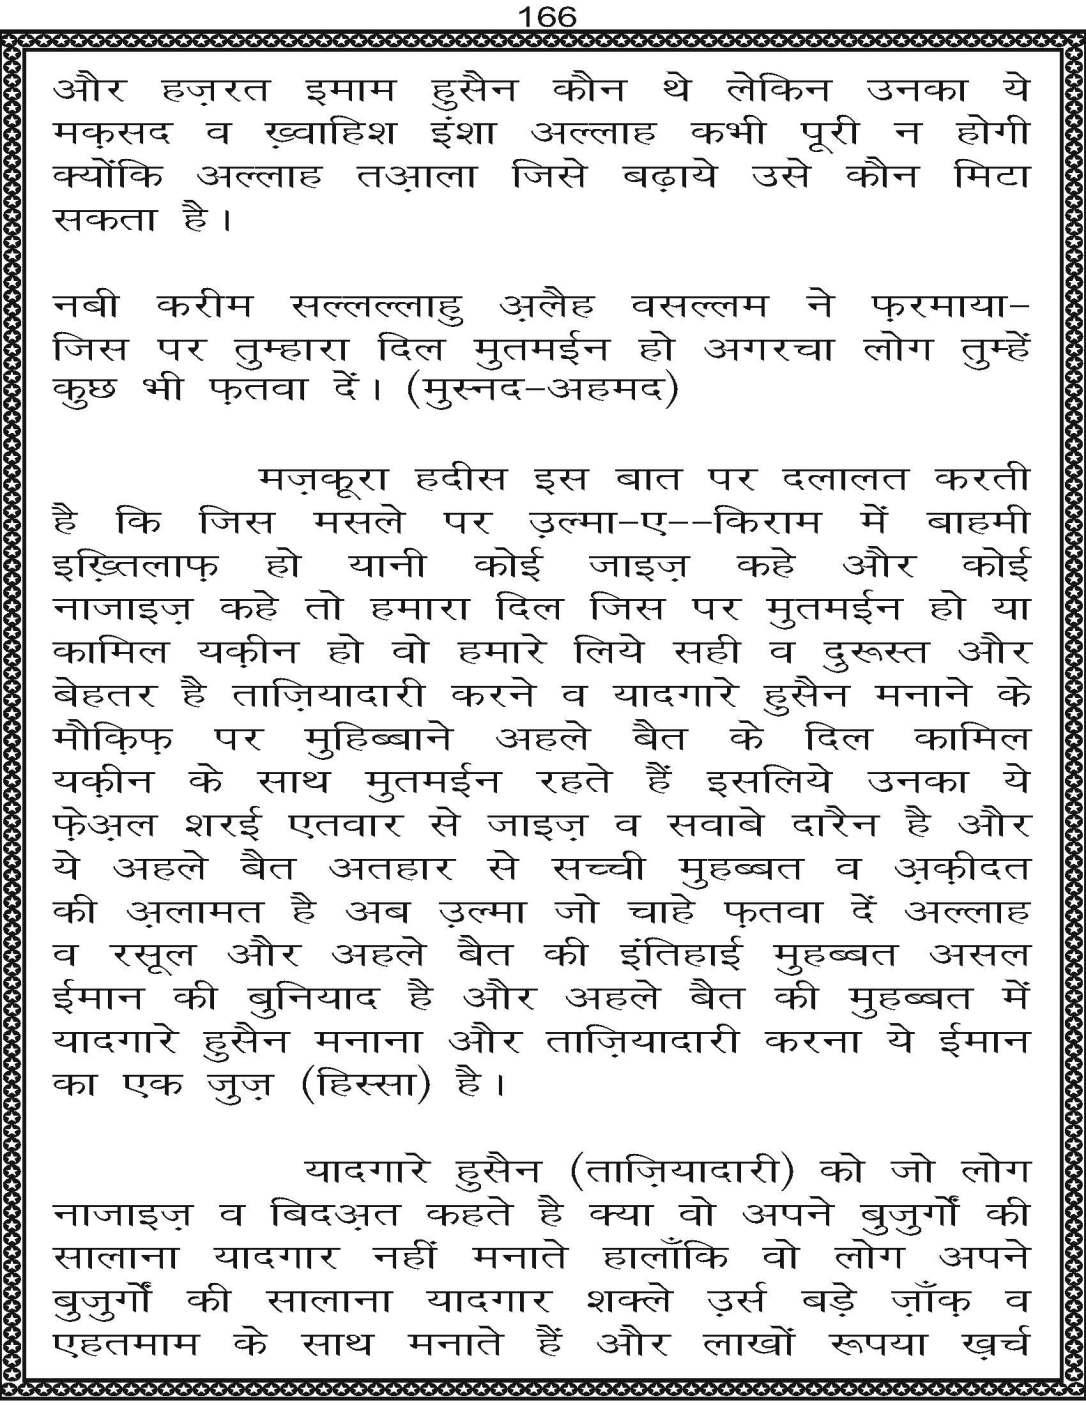 AzmateTaziyadari_Page_166